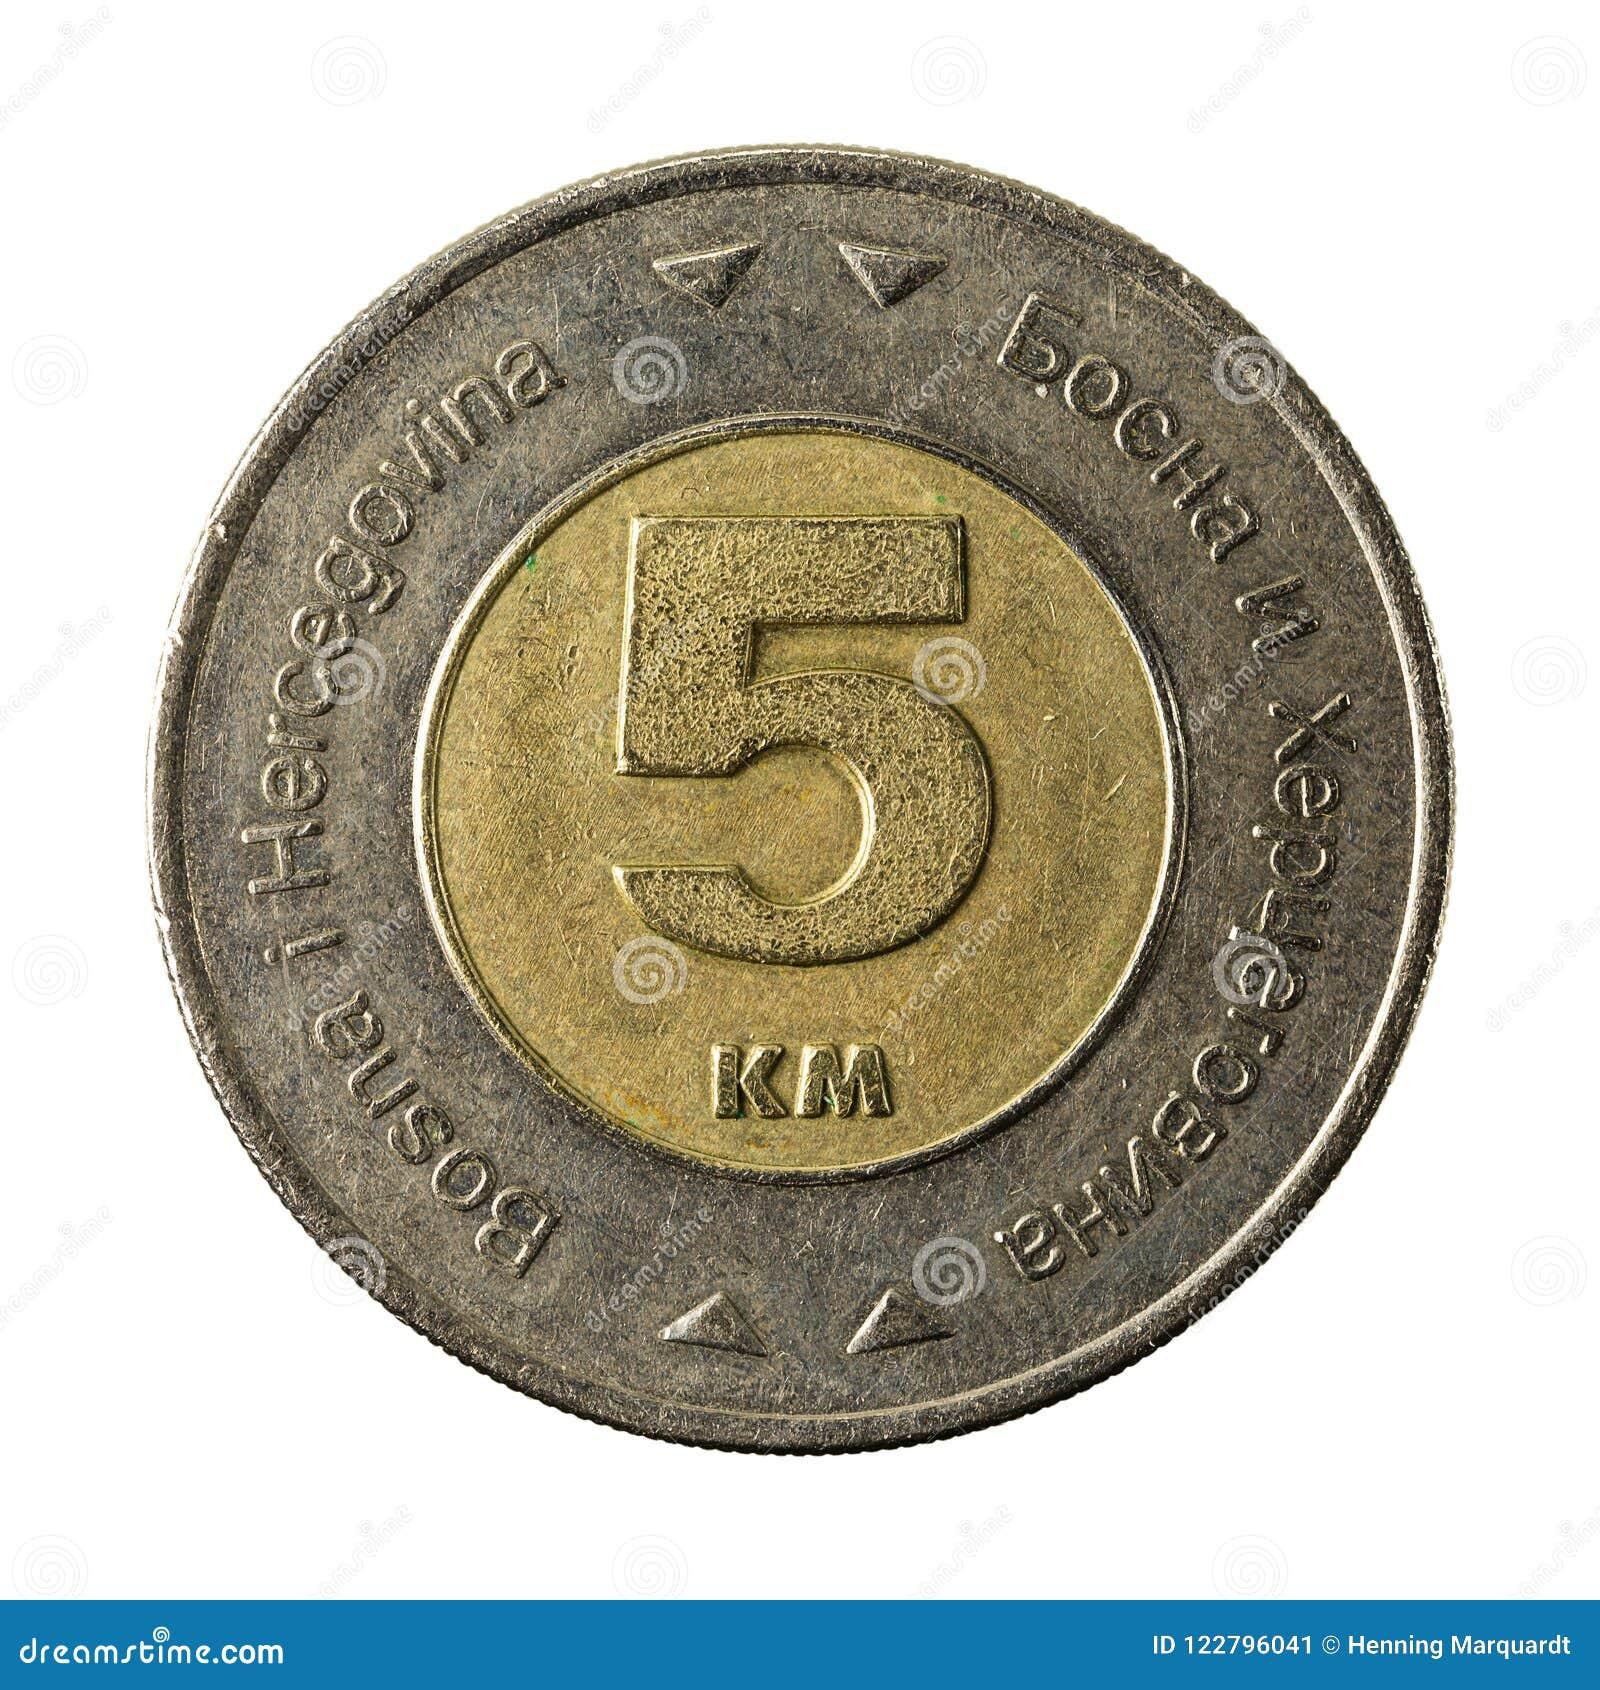 5 bosnia and herzegovina convertible mark coin 2009 obverse